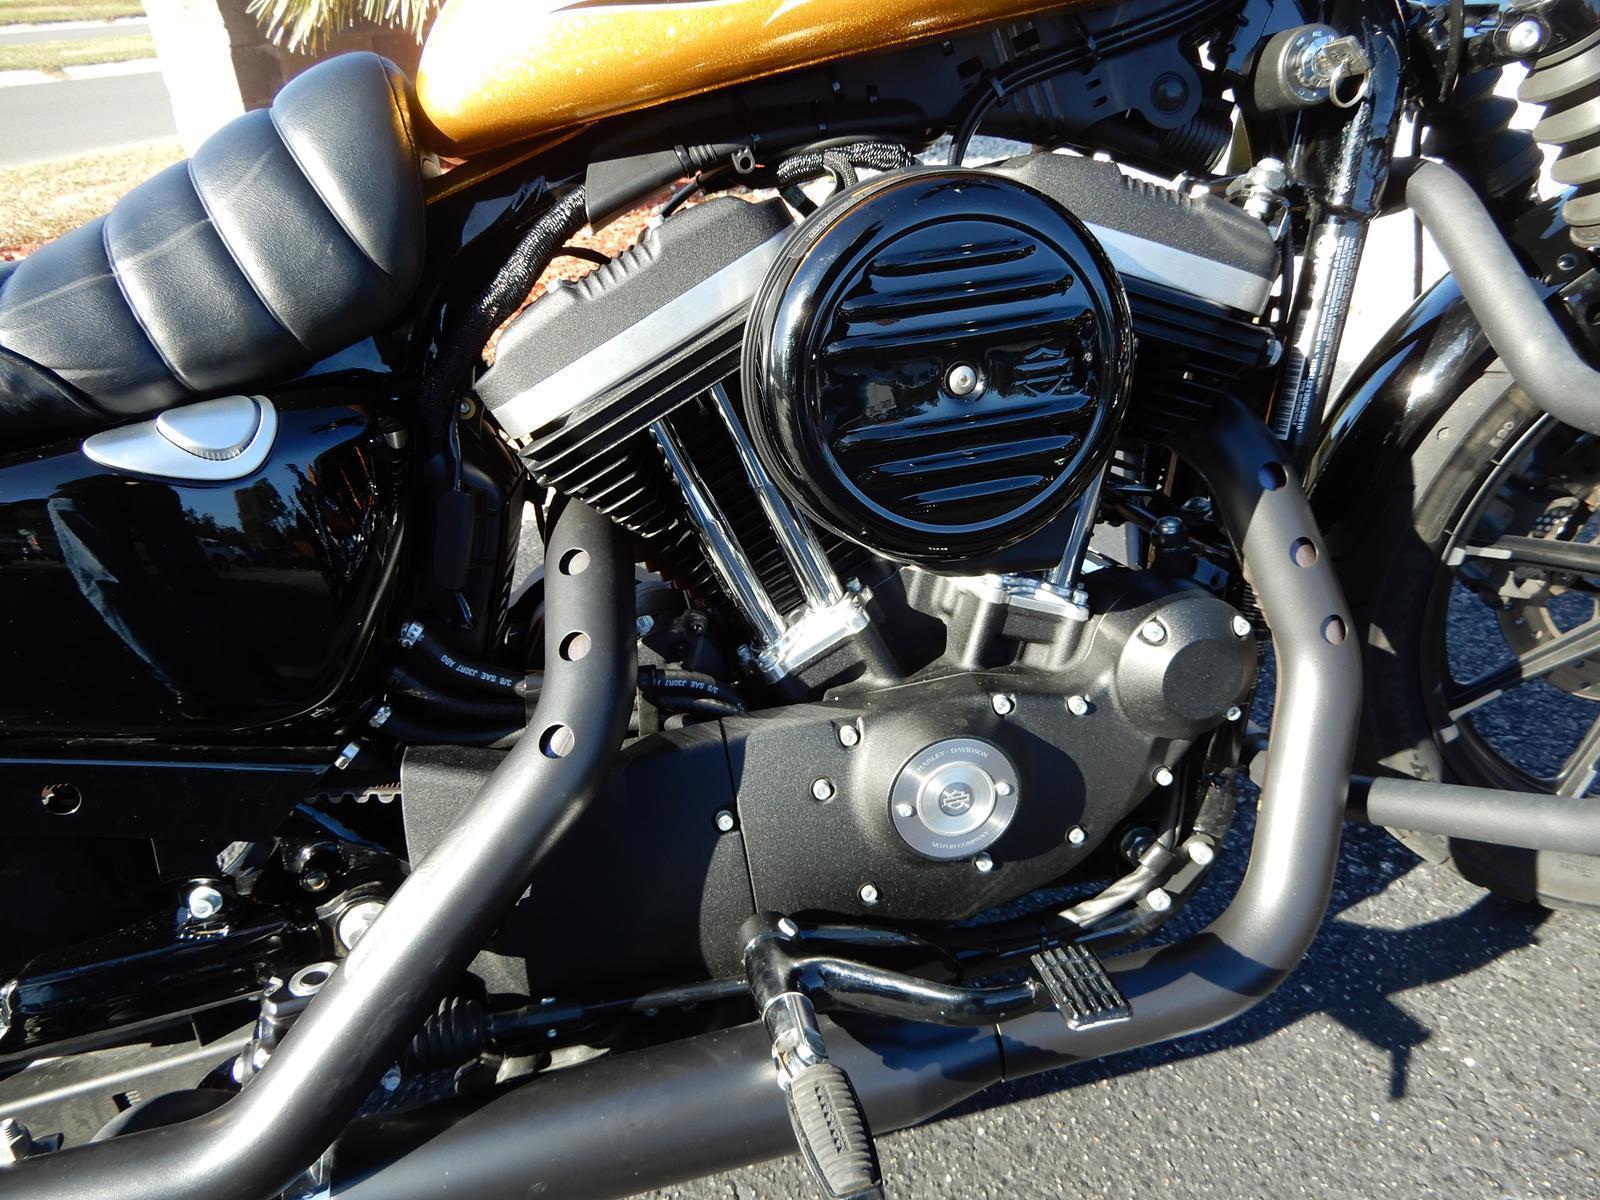 2016 Harley Davidson Sportster Iron 883 For Sale In Myrtle Beach Wire Harness A 73 Ironhead Dscn4289